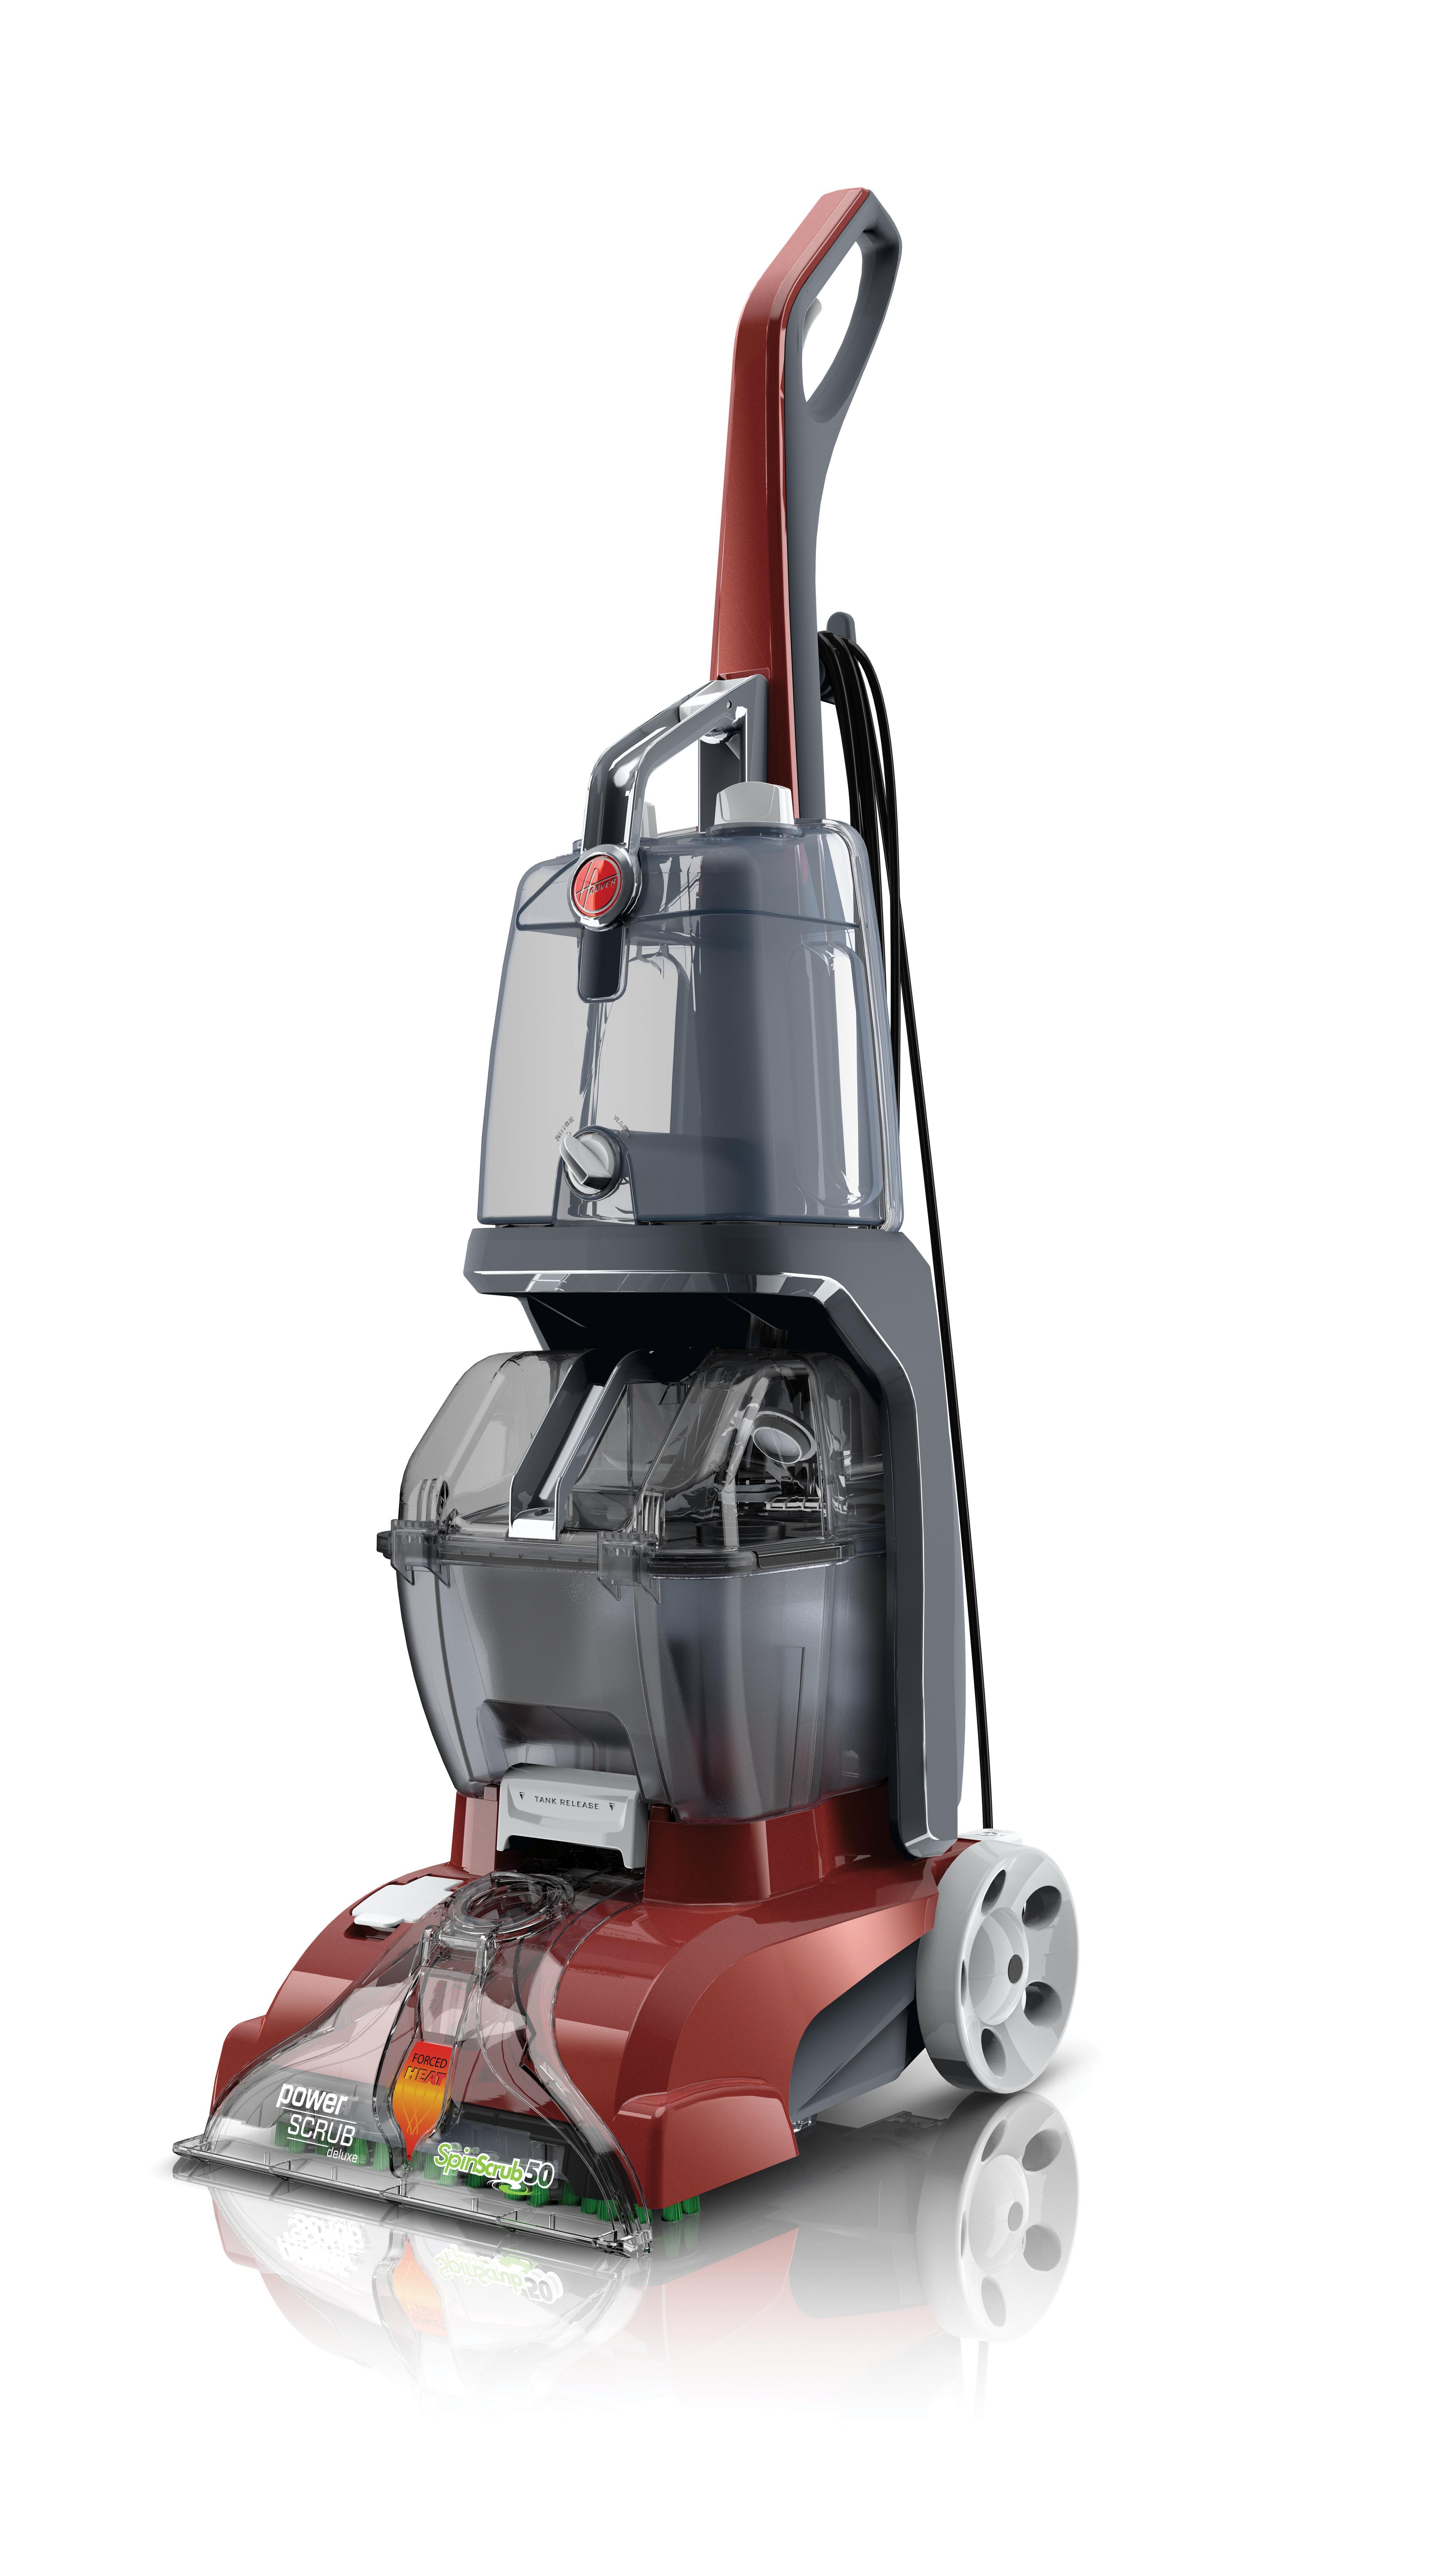 Power Scrub Deluxe Carpet Cleaner2